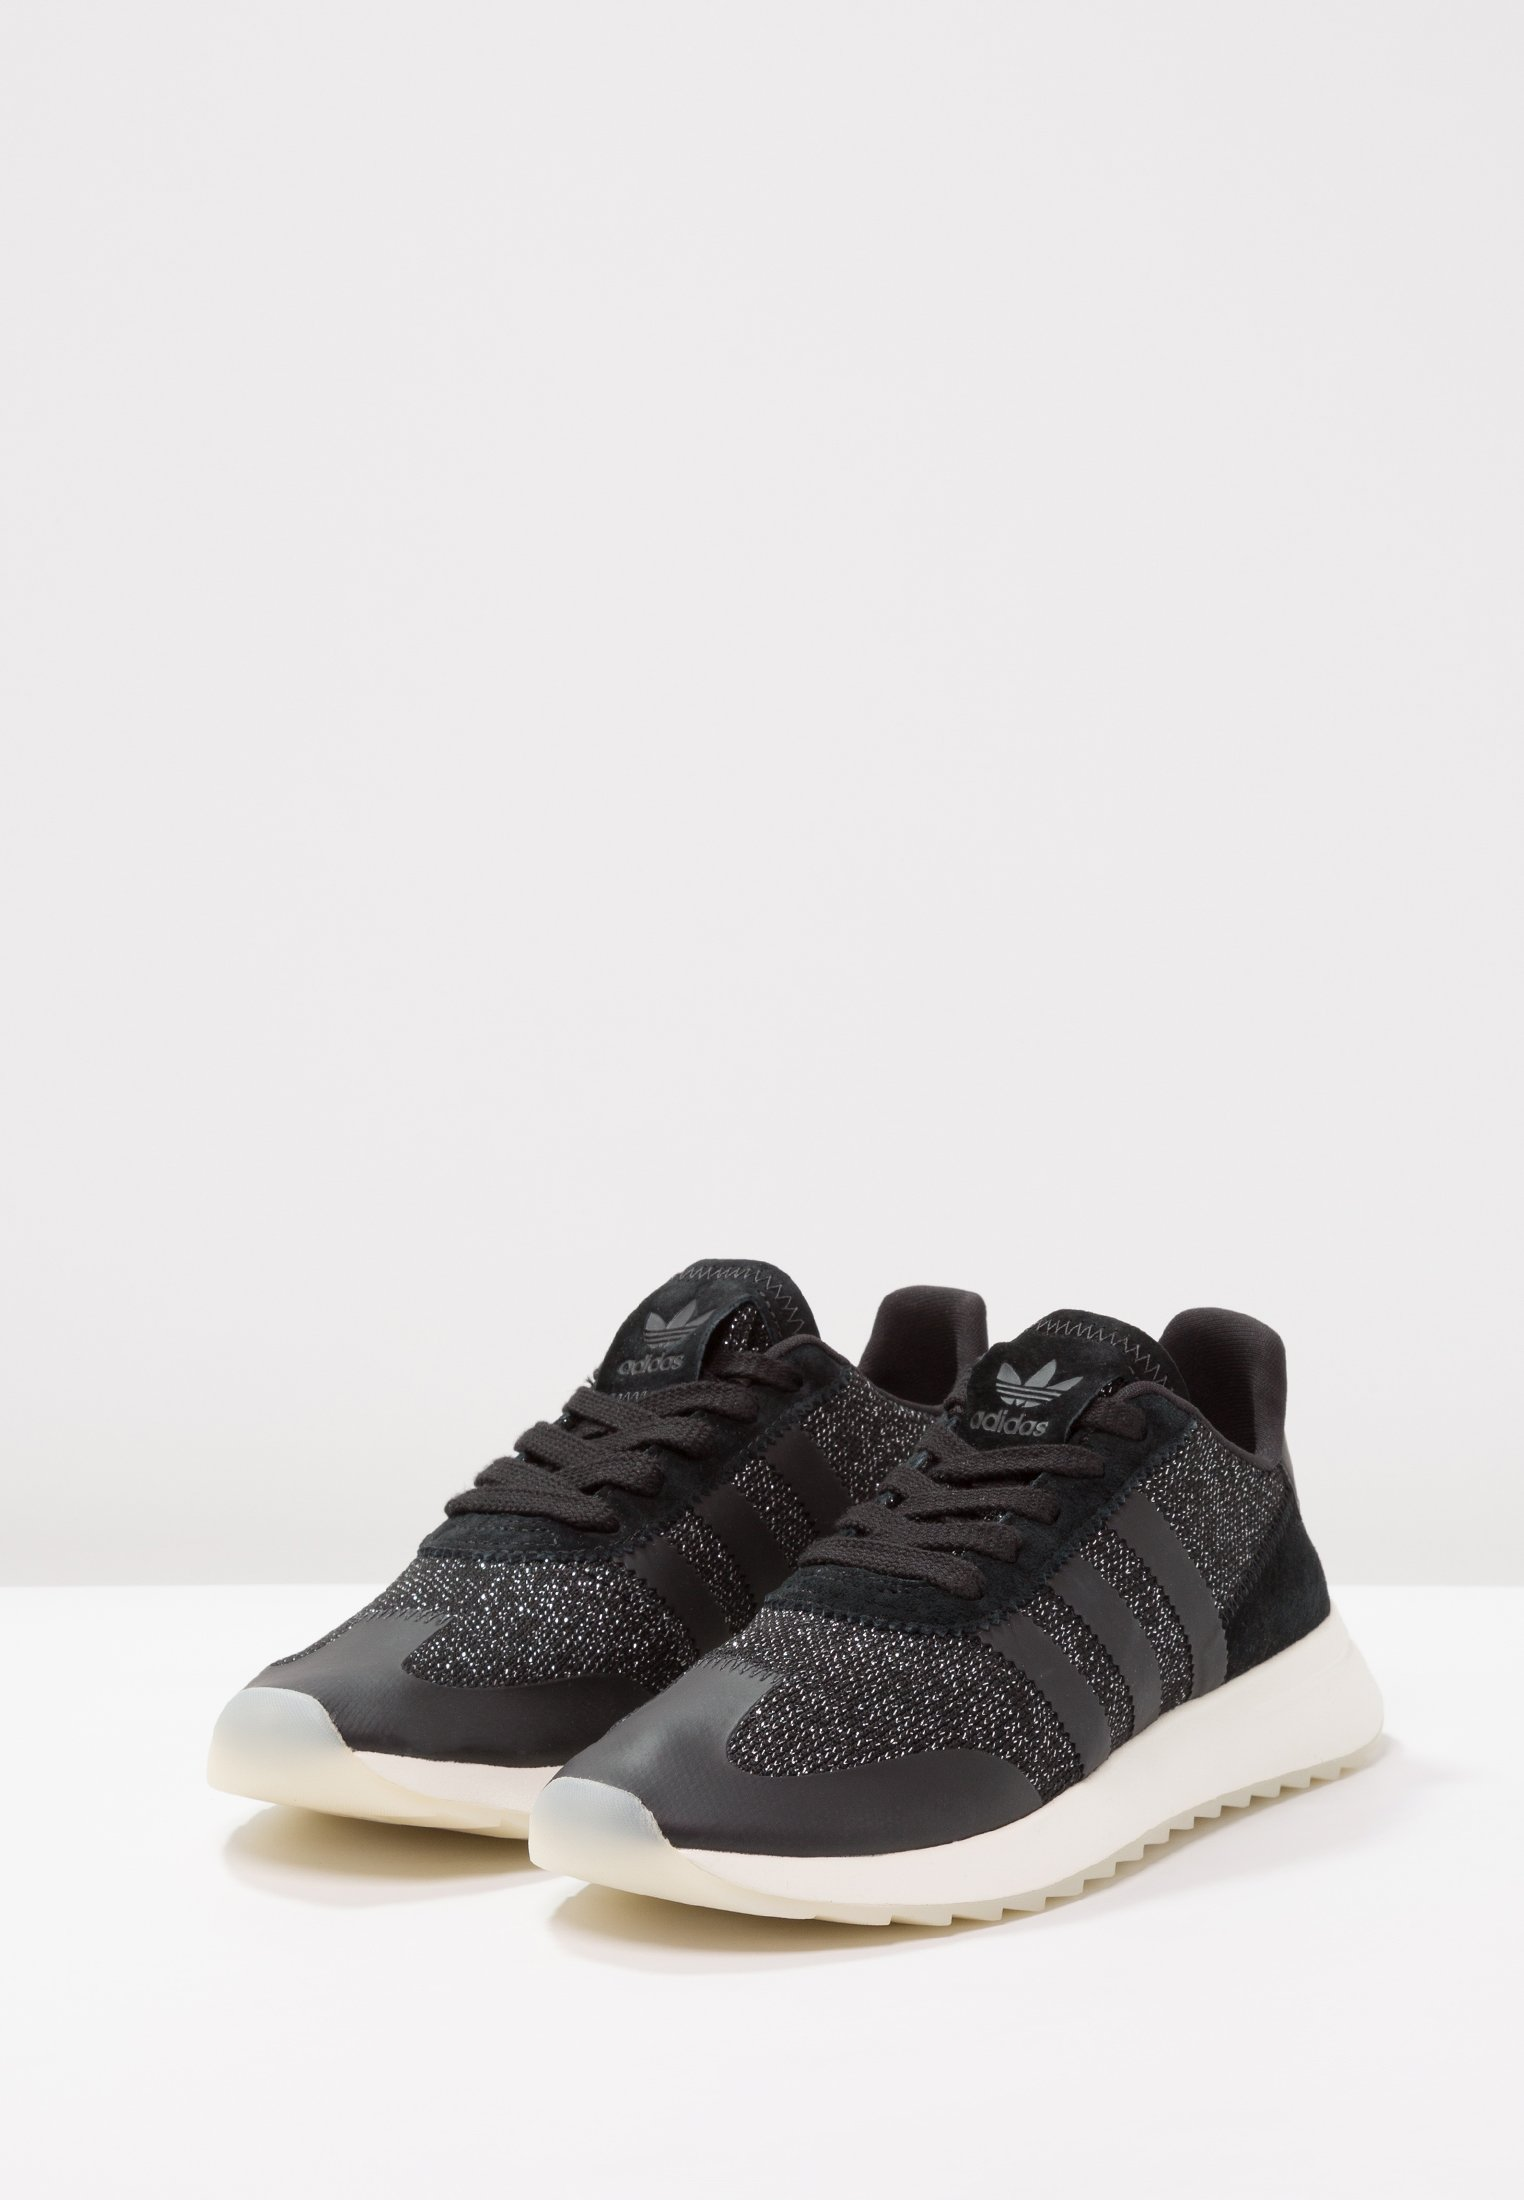 adidas flashback sneaker low